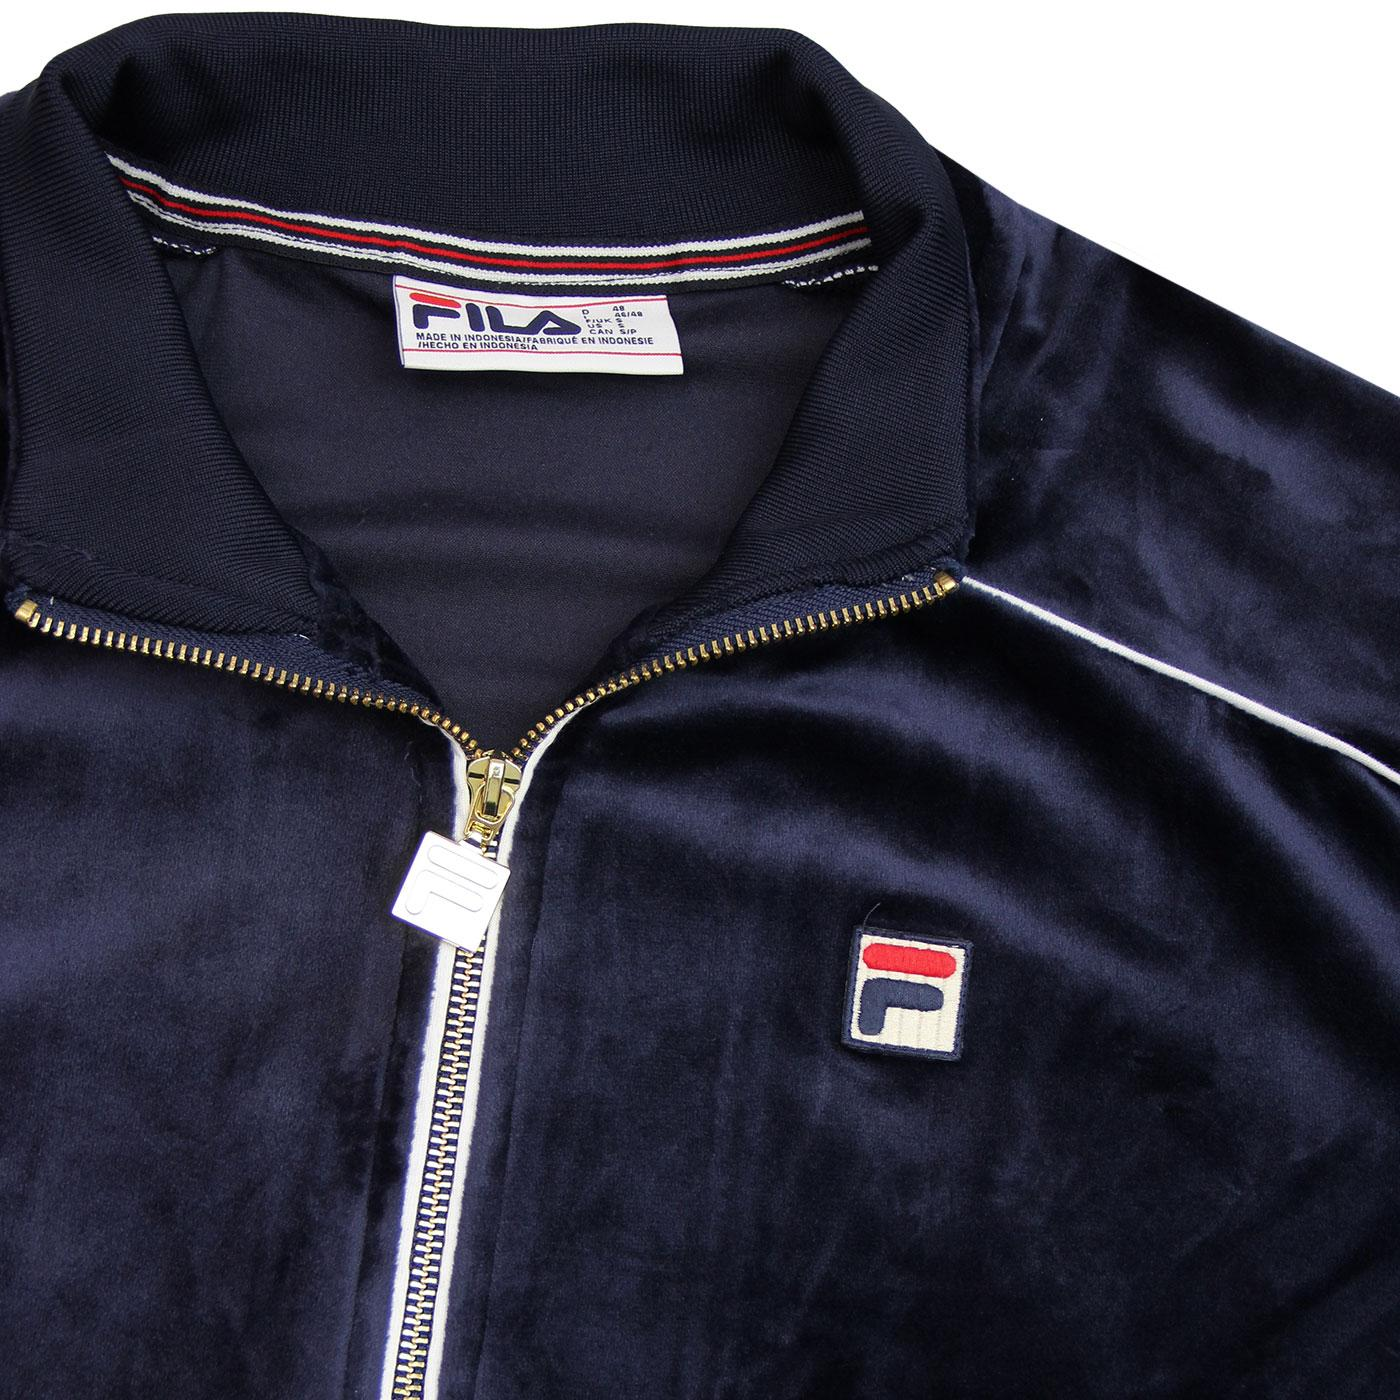 2a0055b923f1 Lineker Fila Vintage 80s Velour Track Top Peacoat